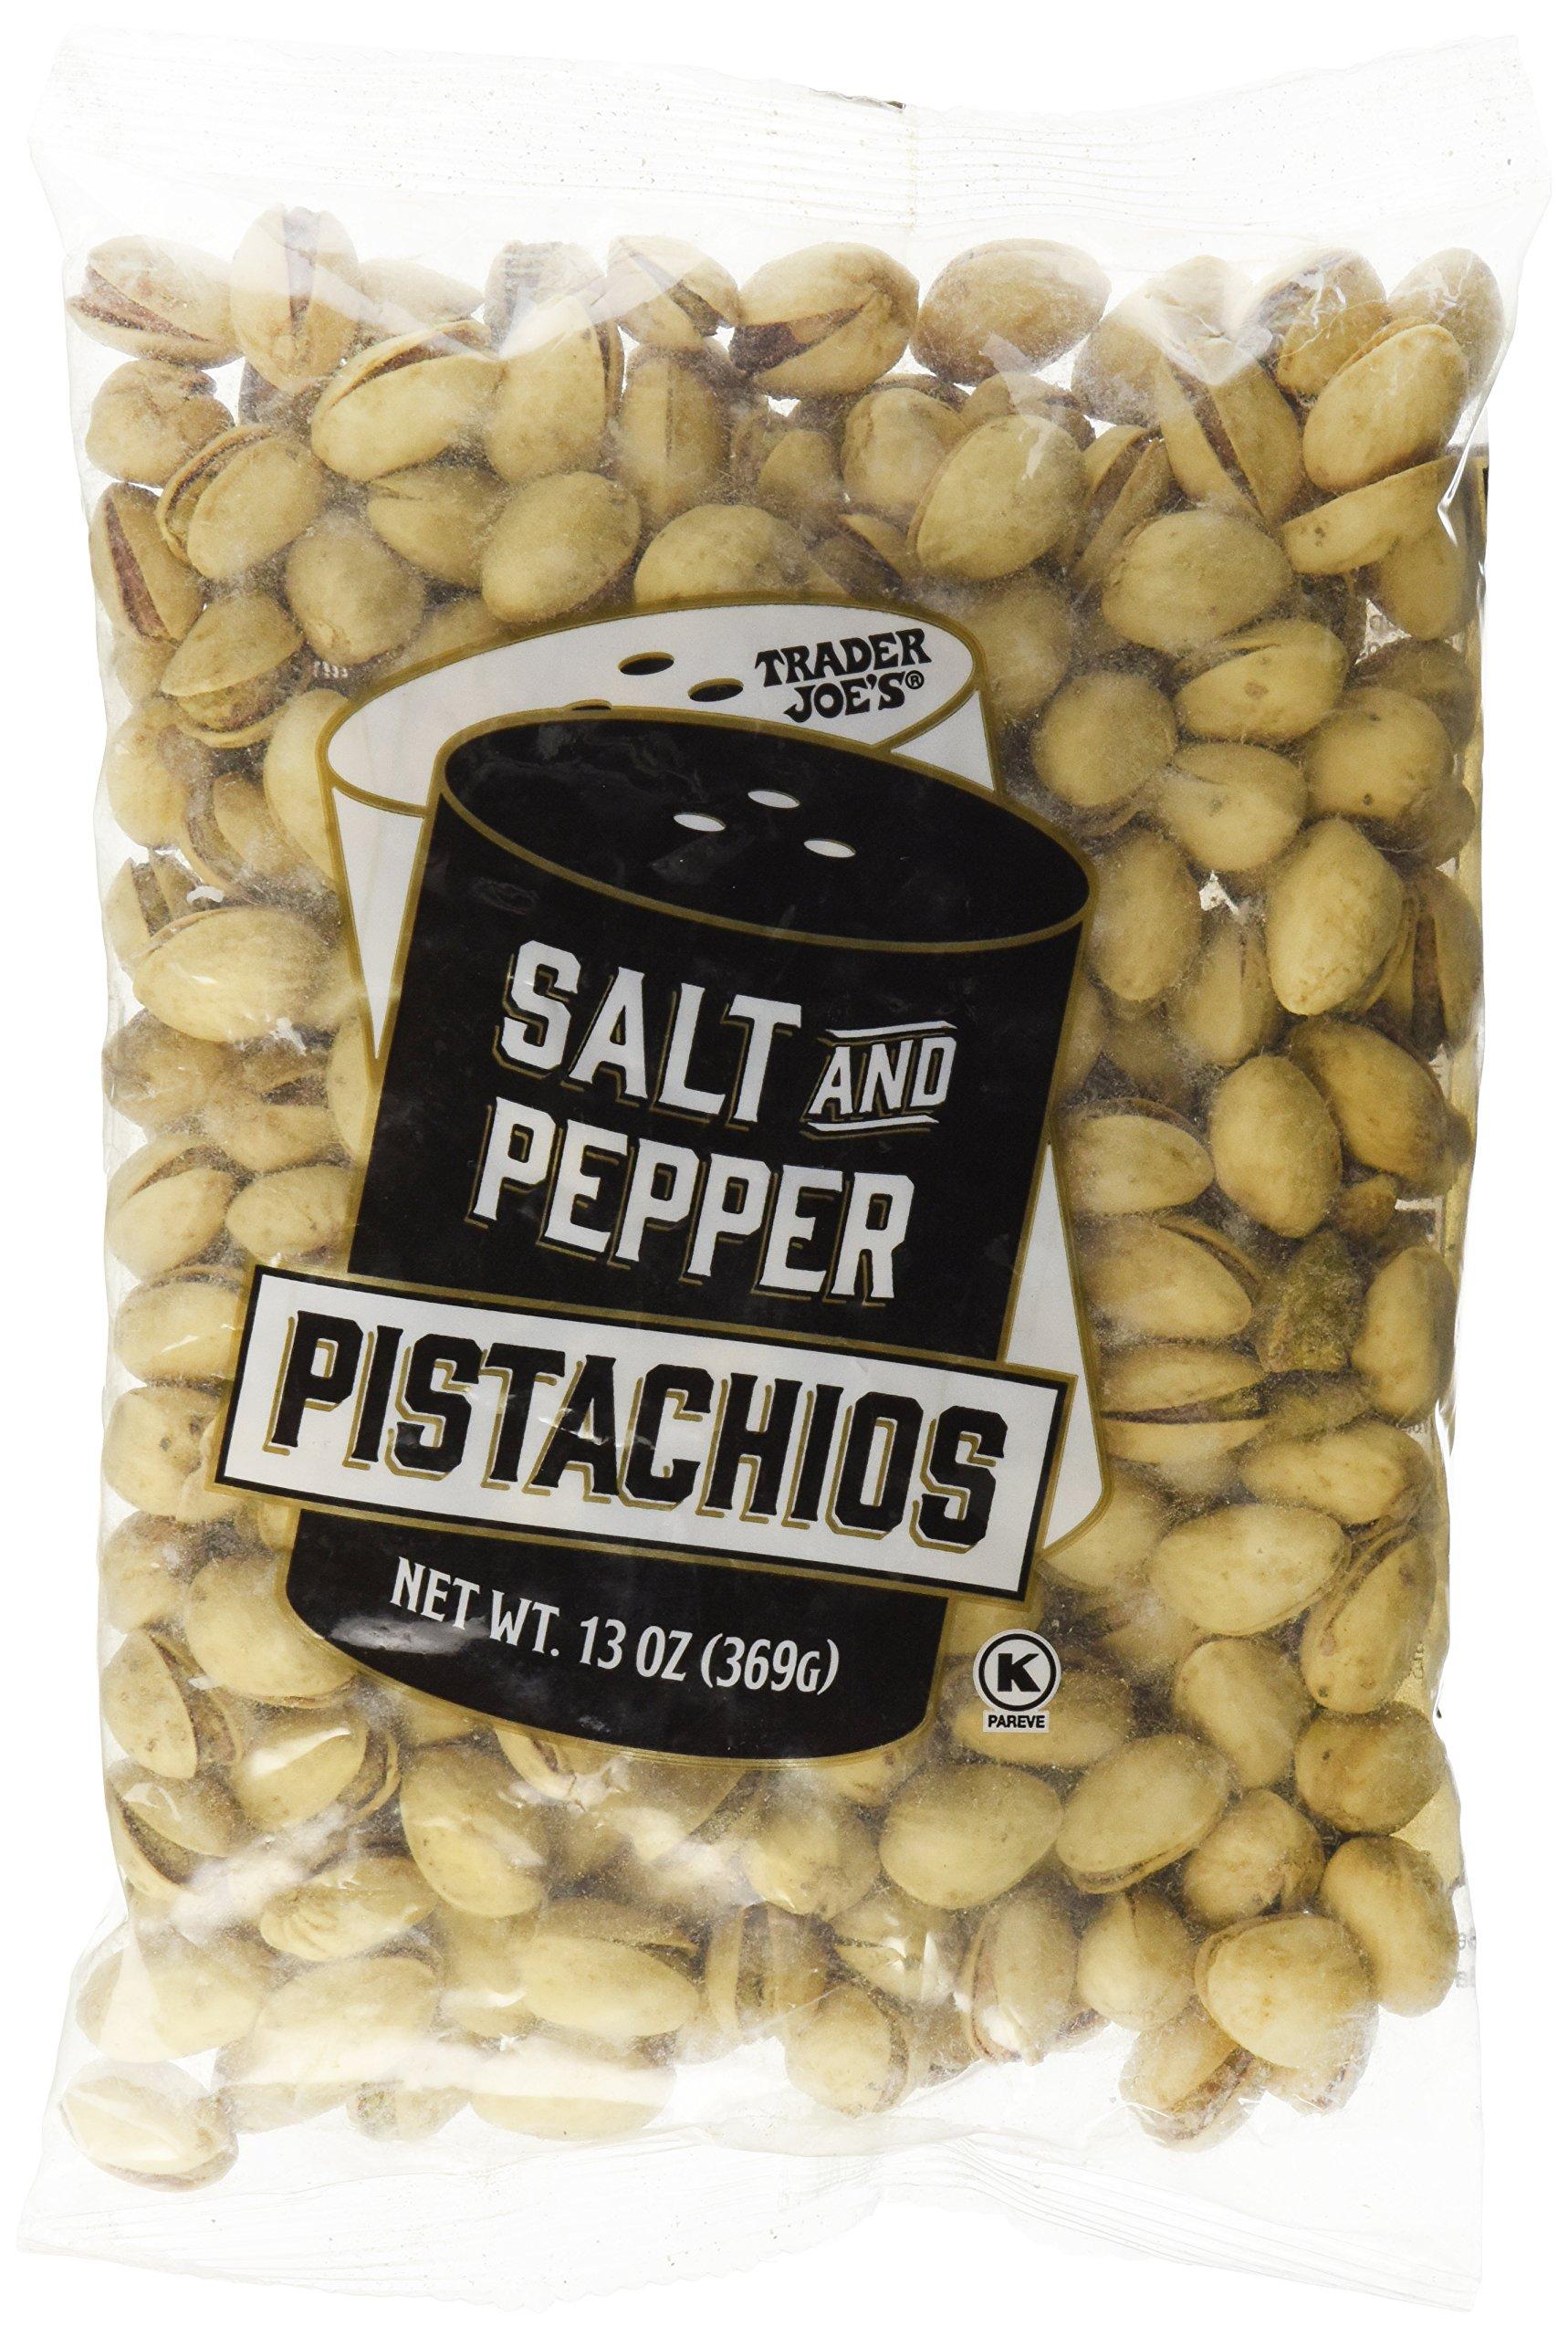 Trader Joe's Salt and Pepper Pistachios